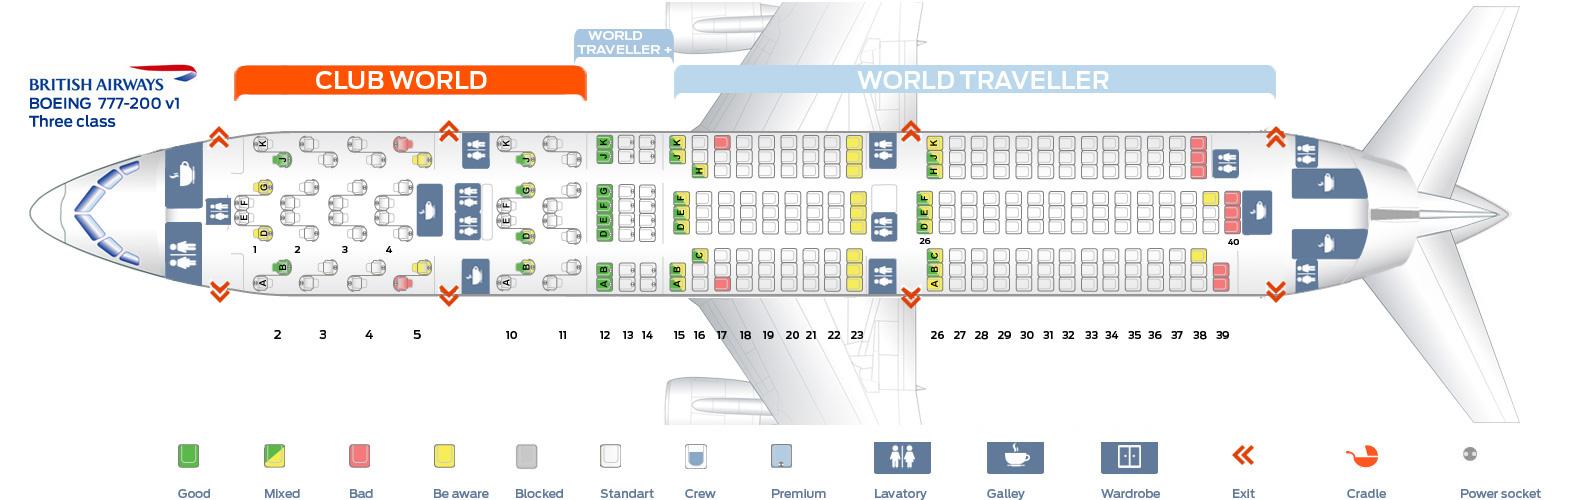 Seat_map_British_Airways_Boeing-777_200_three_class_v1